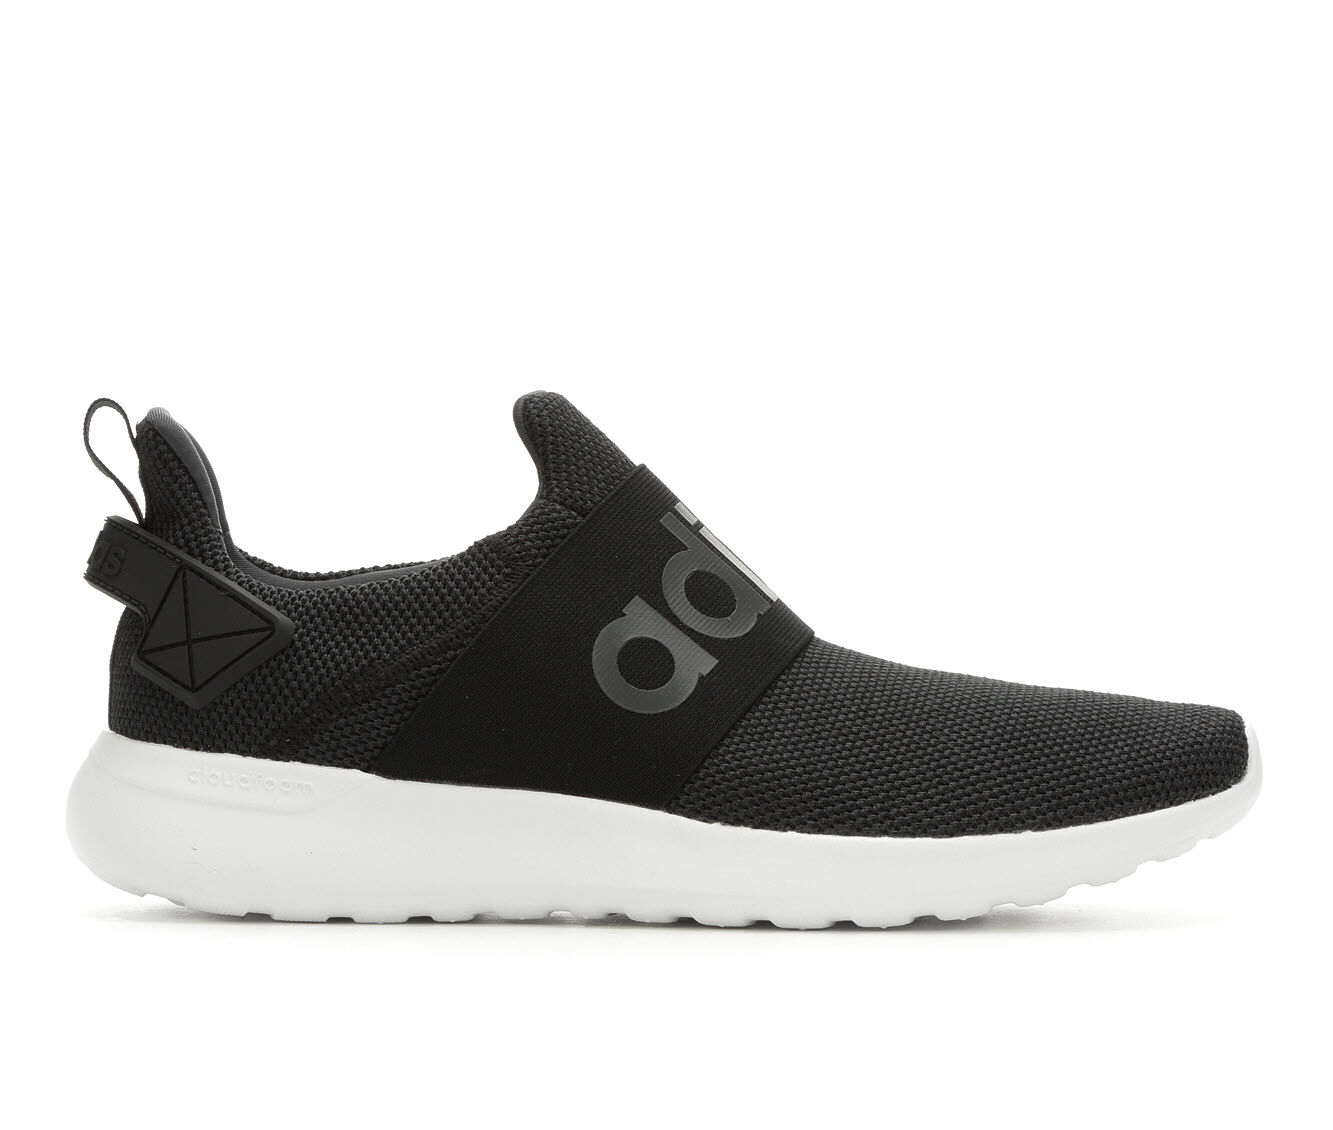 Sale Low Price Men's Adidas Cloudfoam Lite Racer Adapt Sneakers Black/White